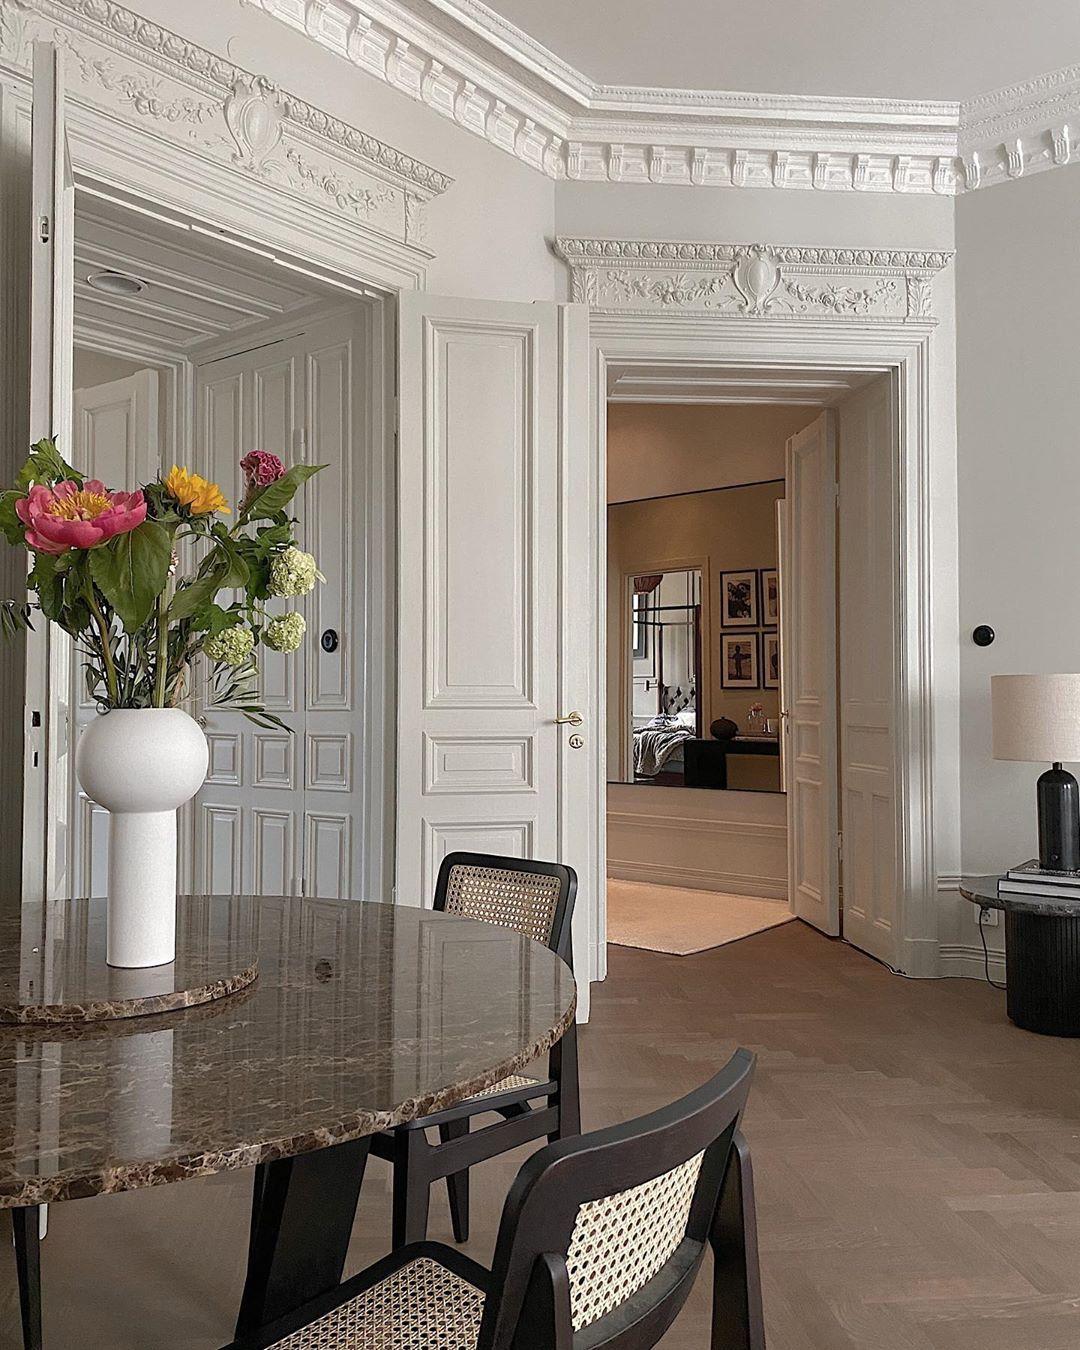 Louise Hjorth Design Louisehjorthdesign Posted On Instagram Jun 1 2020 At 5 50am Utc Interiors Dream House Design Home